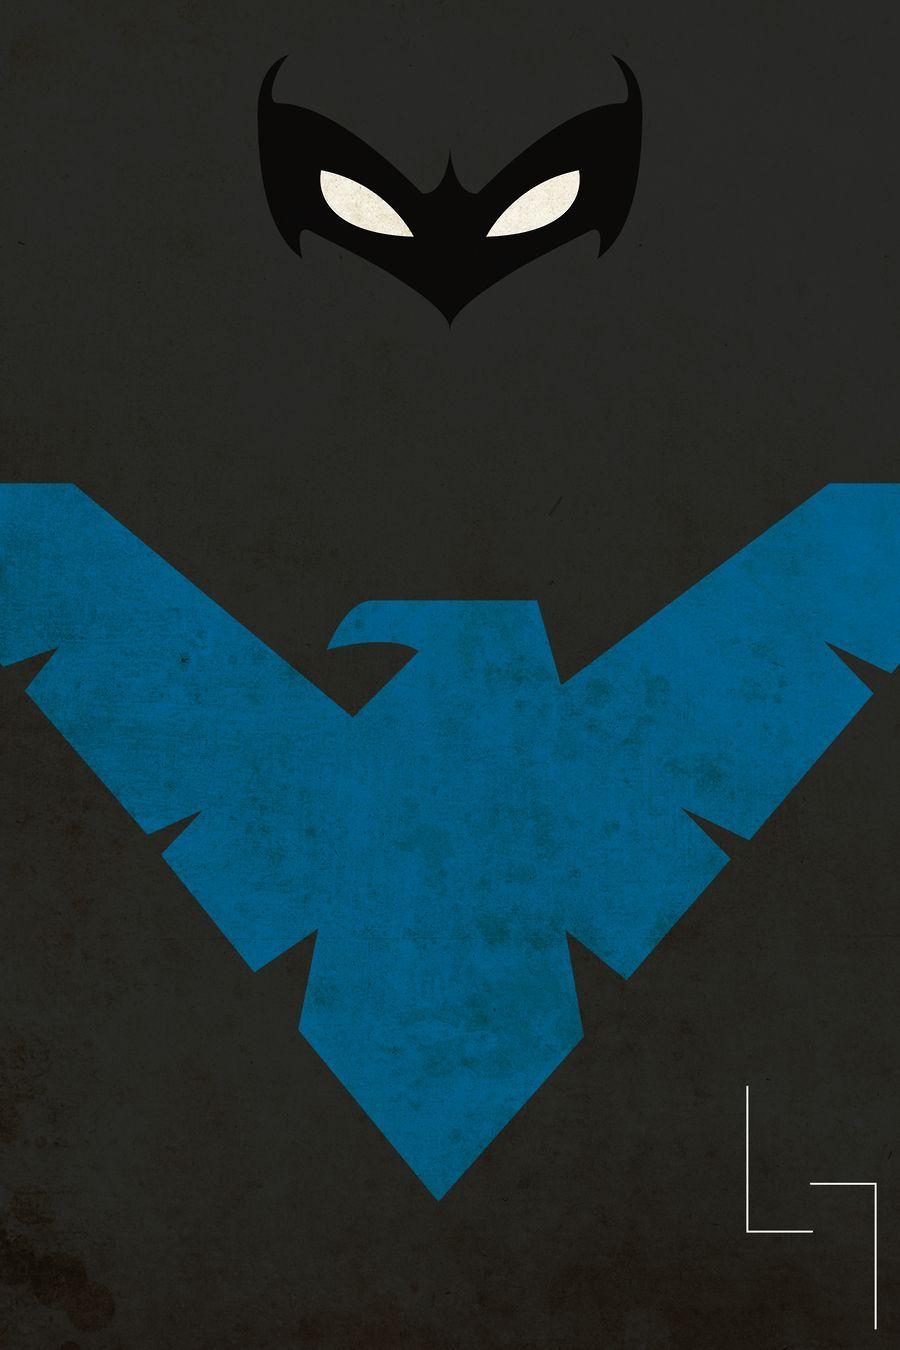 Original 60cbe2486ccb8053bdee34562dbff19c Jpg Nightwing Wallpaper Nightwing Nightwing Art